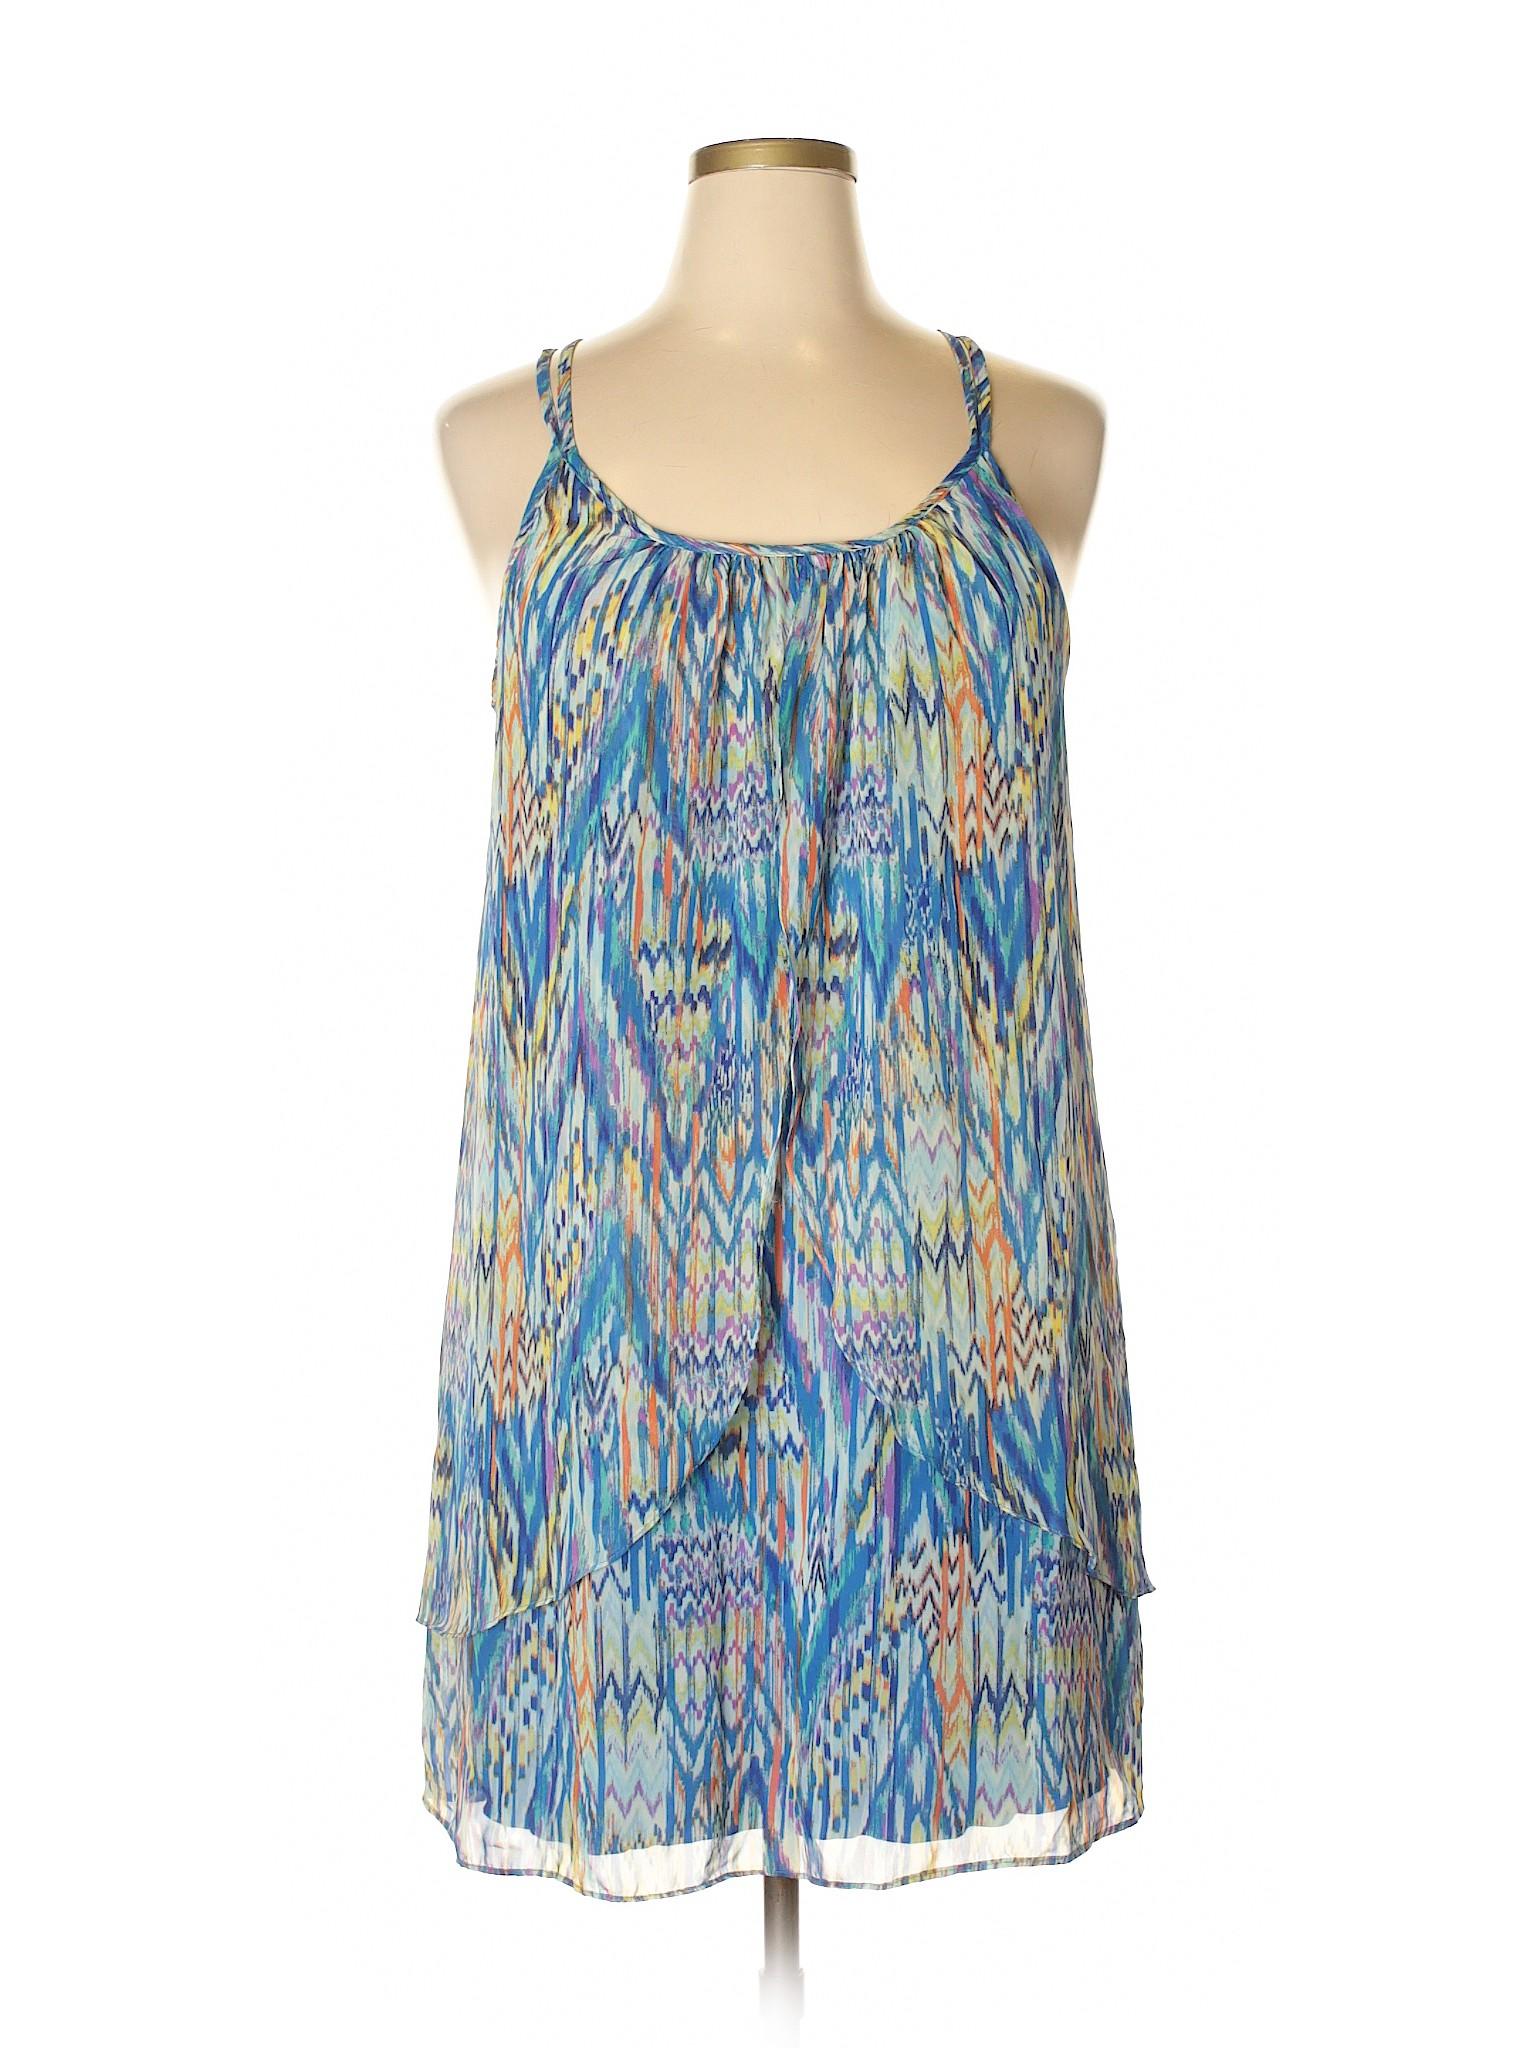 Casual Dress Casual Bisou Selling Bisou Bisou Selling Bisou Bisou Dress Selling CUzAS1wq